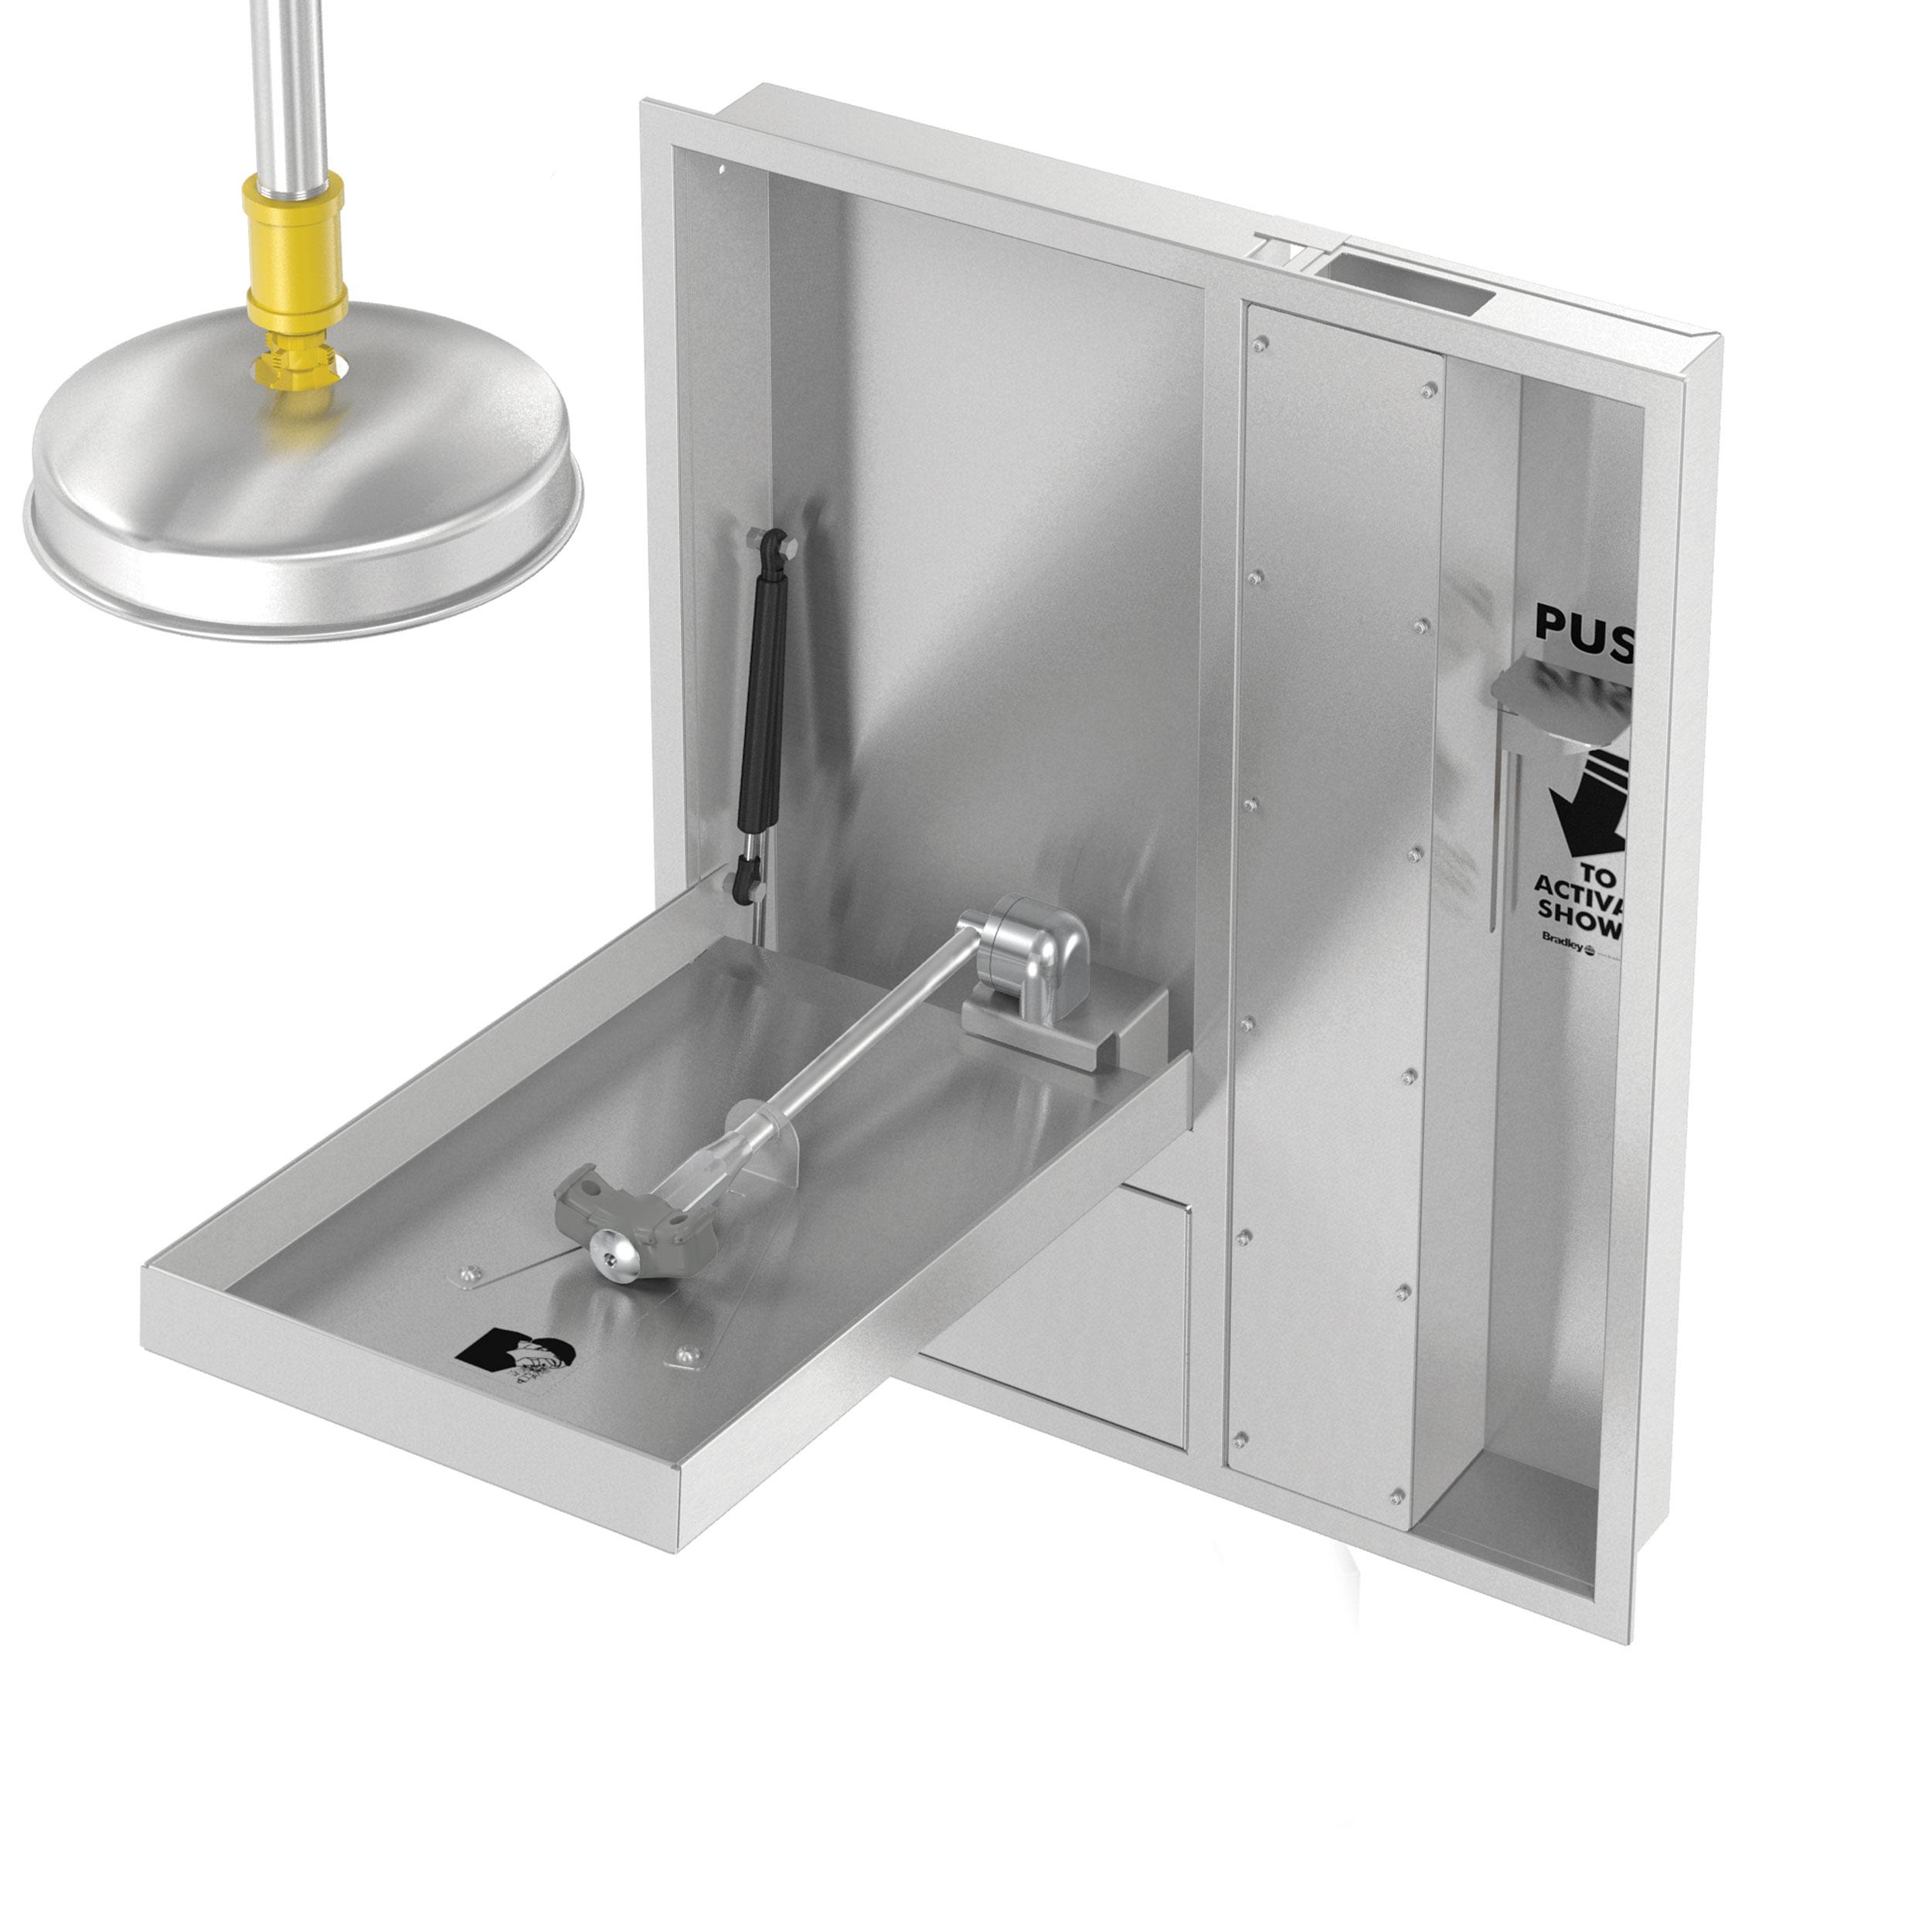 Barrier Free Concealed Eyewash Amp Drench Shower Bradley